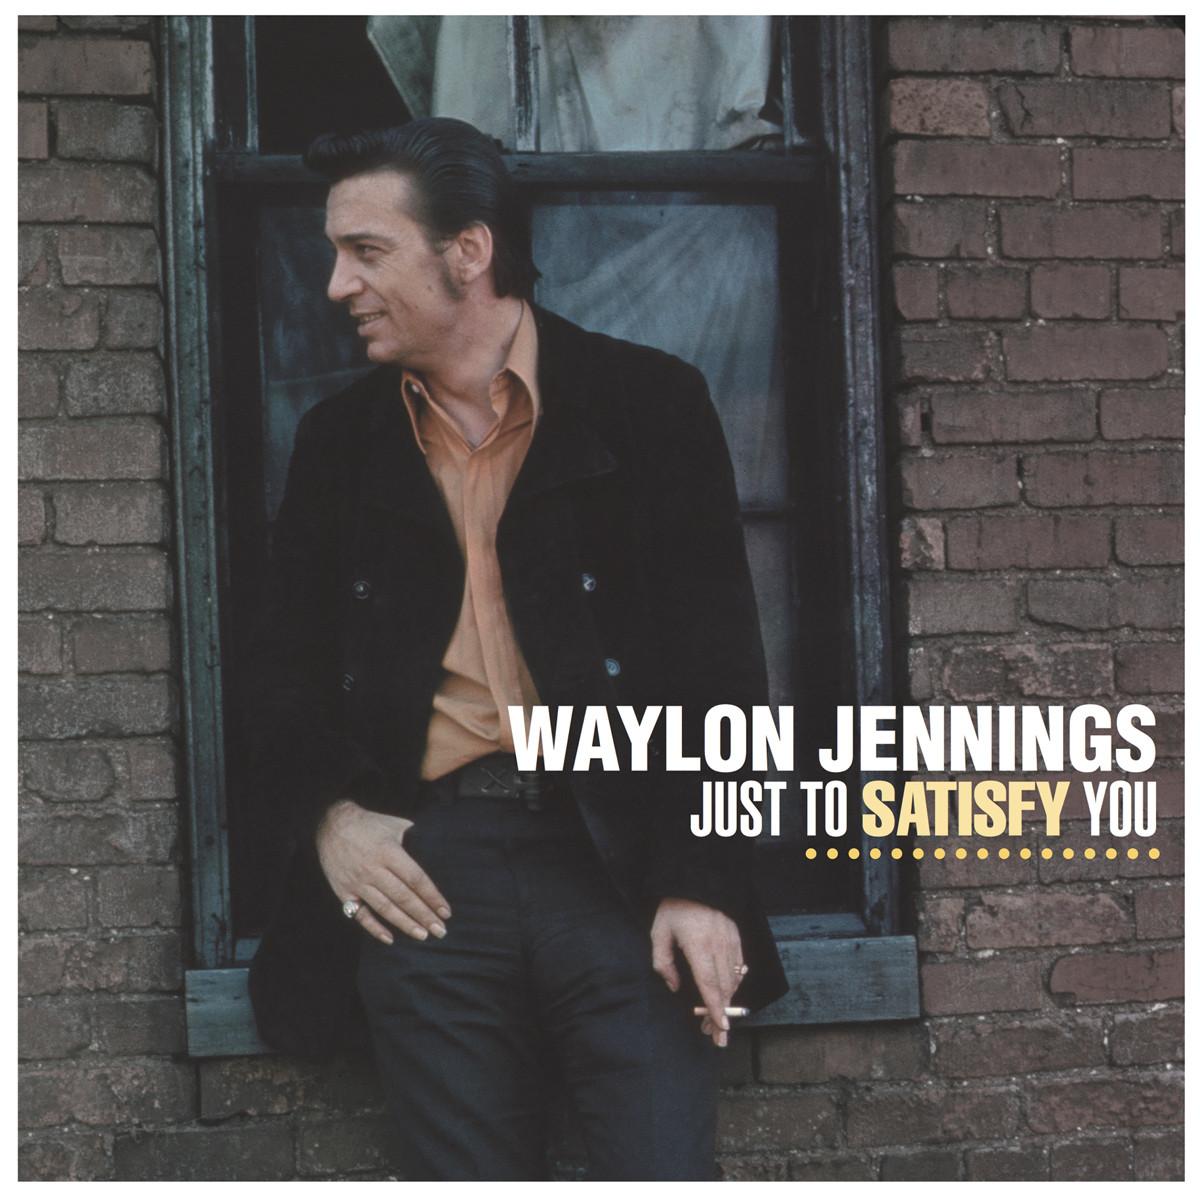 Waylon Jennings - Just To Satisfy You - 180g Vinyl